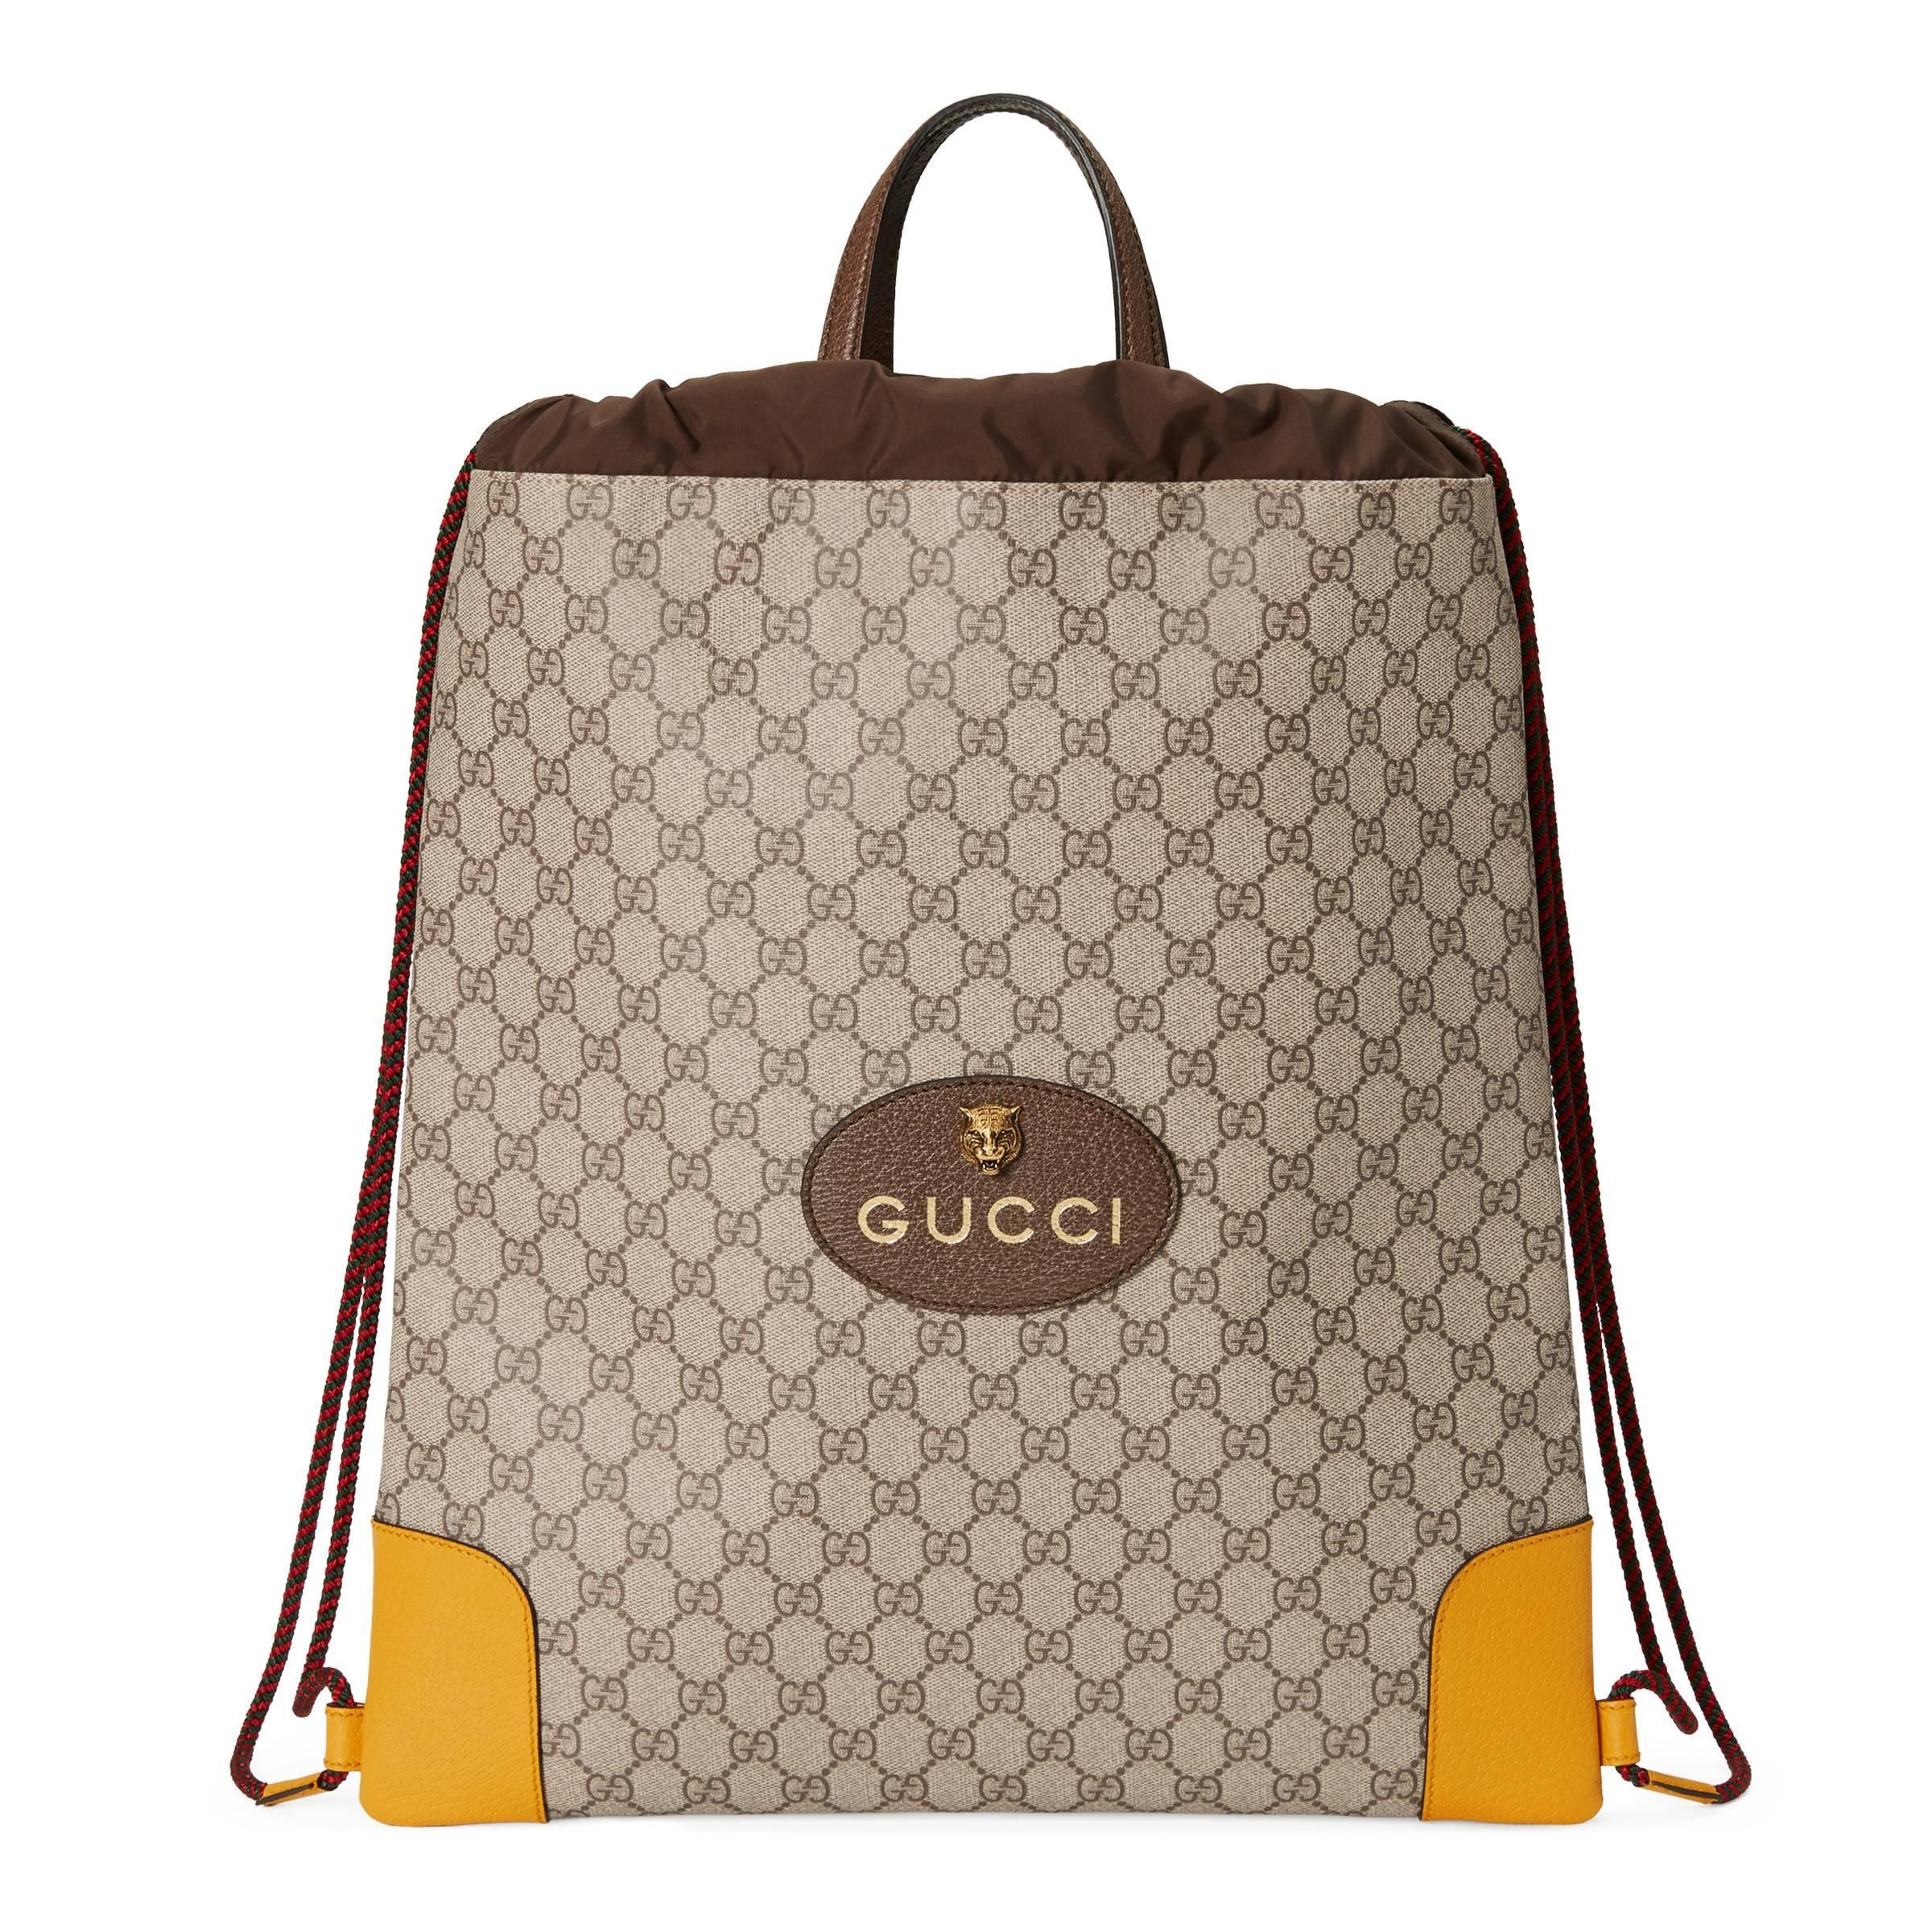 dcb486ec4 Gucci - Natural Mochila GG Supreme con Tira for Men - Lyst. Ver en pantalla  completa